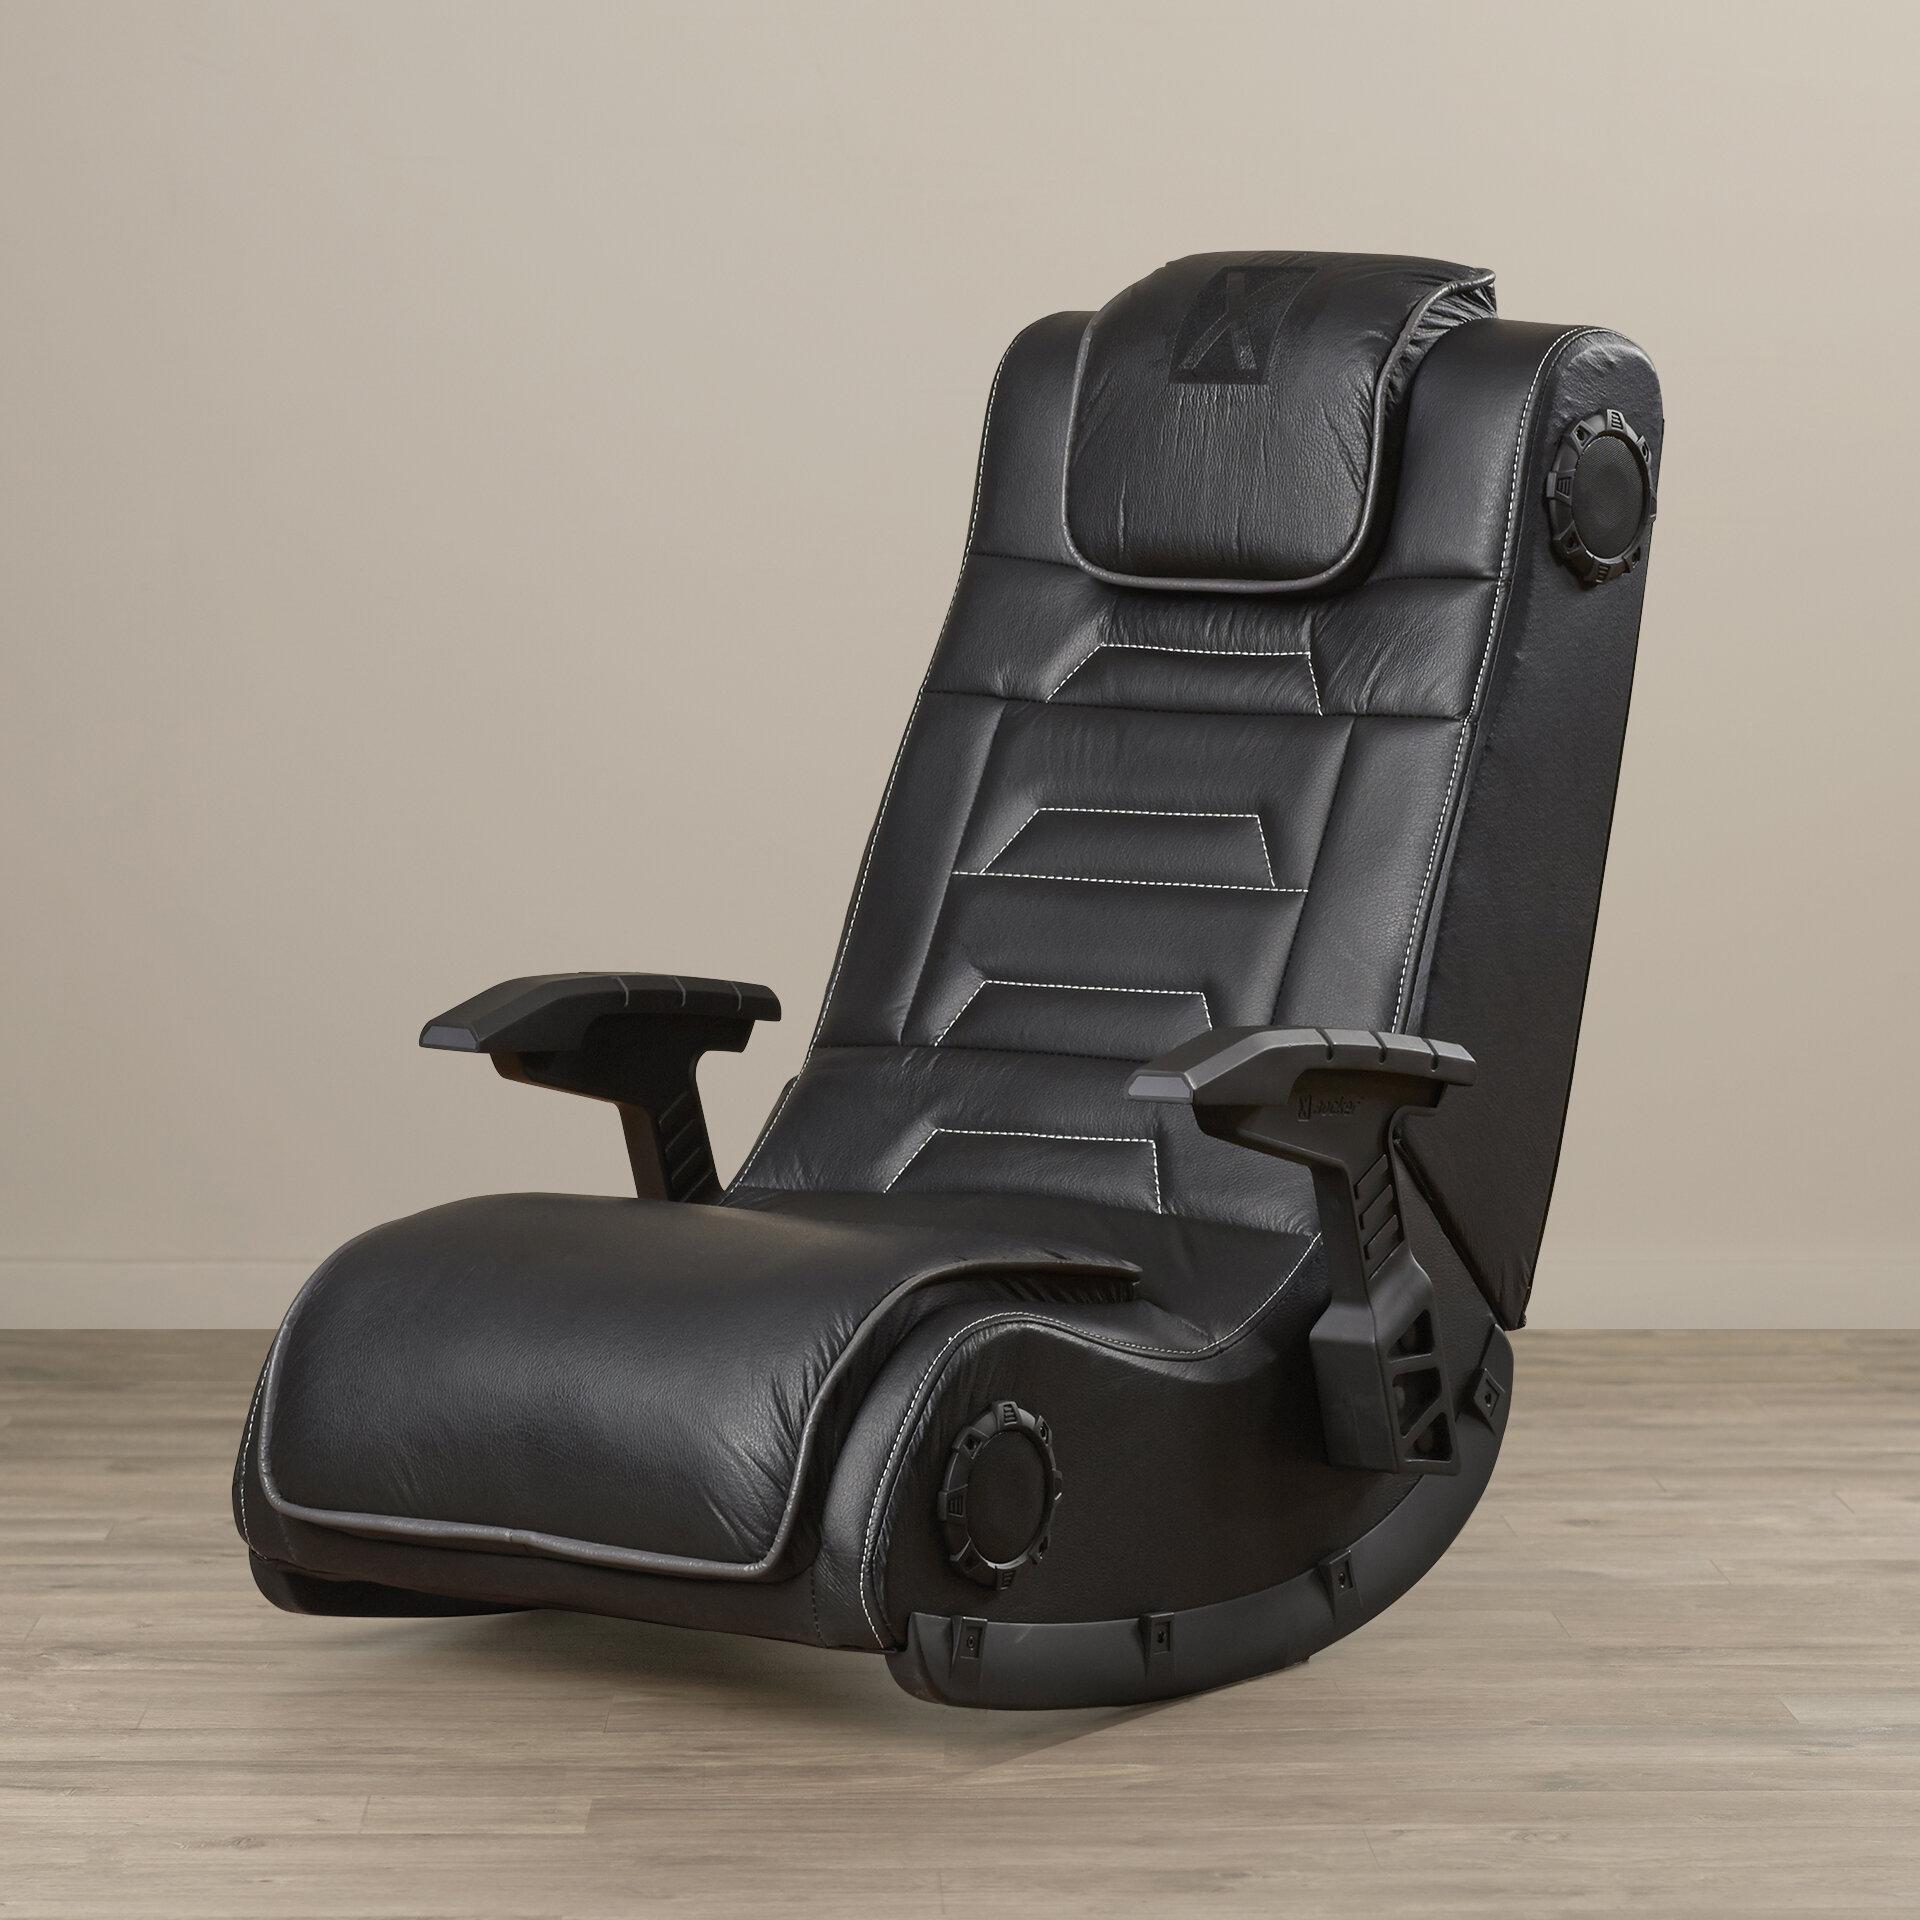 Charmant Orren Ellis Wireless Video Rocker Game Chair U0026 Reviews   Wayfair